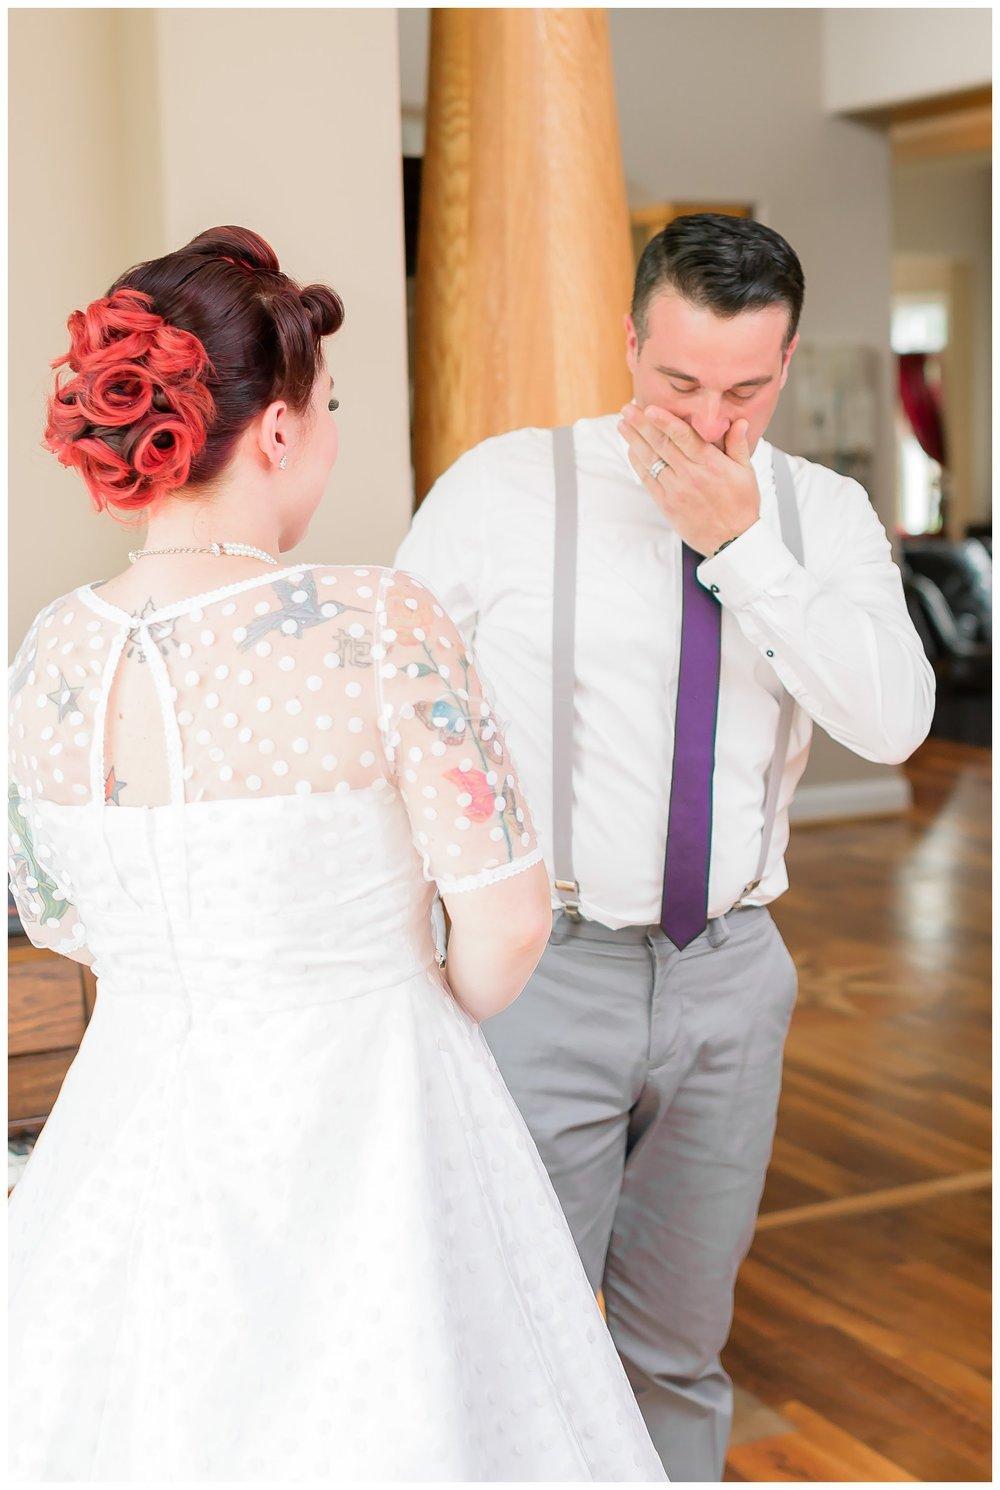 Kat and Dave | Married_Stephanie Kopf Photography-165.jpg